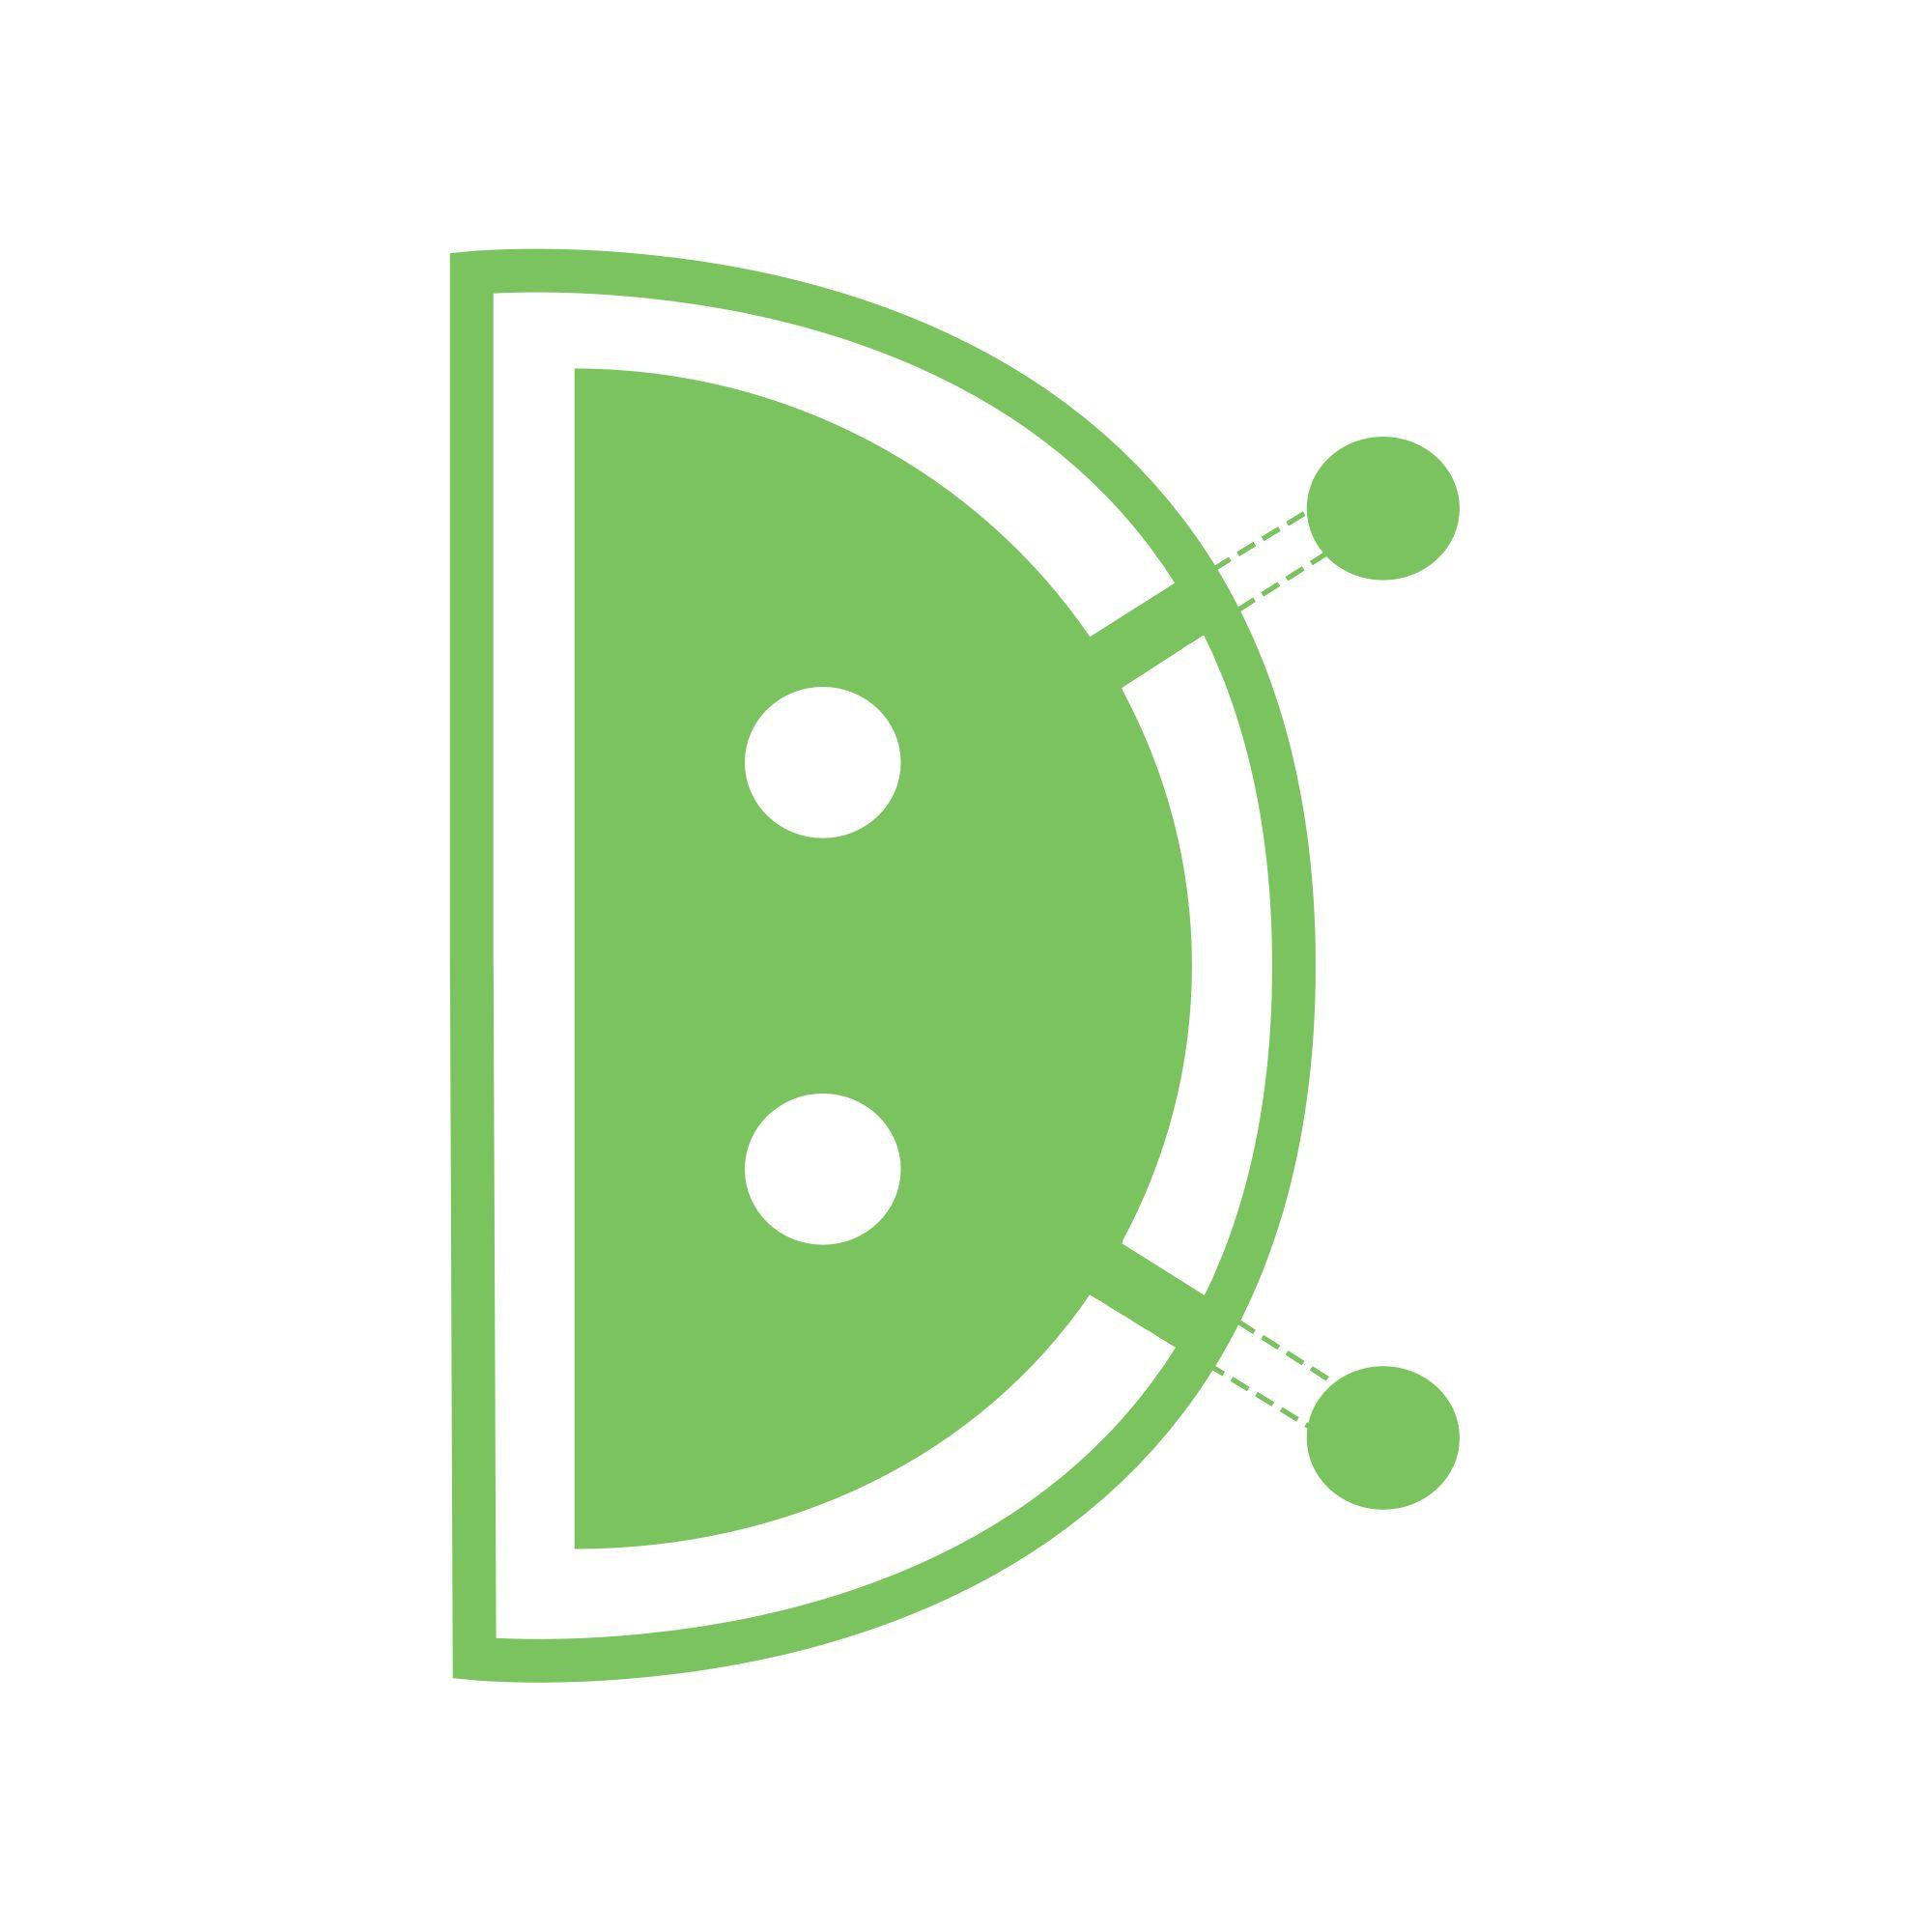 DayToDayDroid | Listen via Stitcher for Podcasts